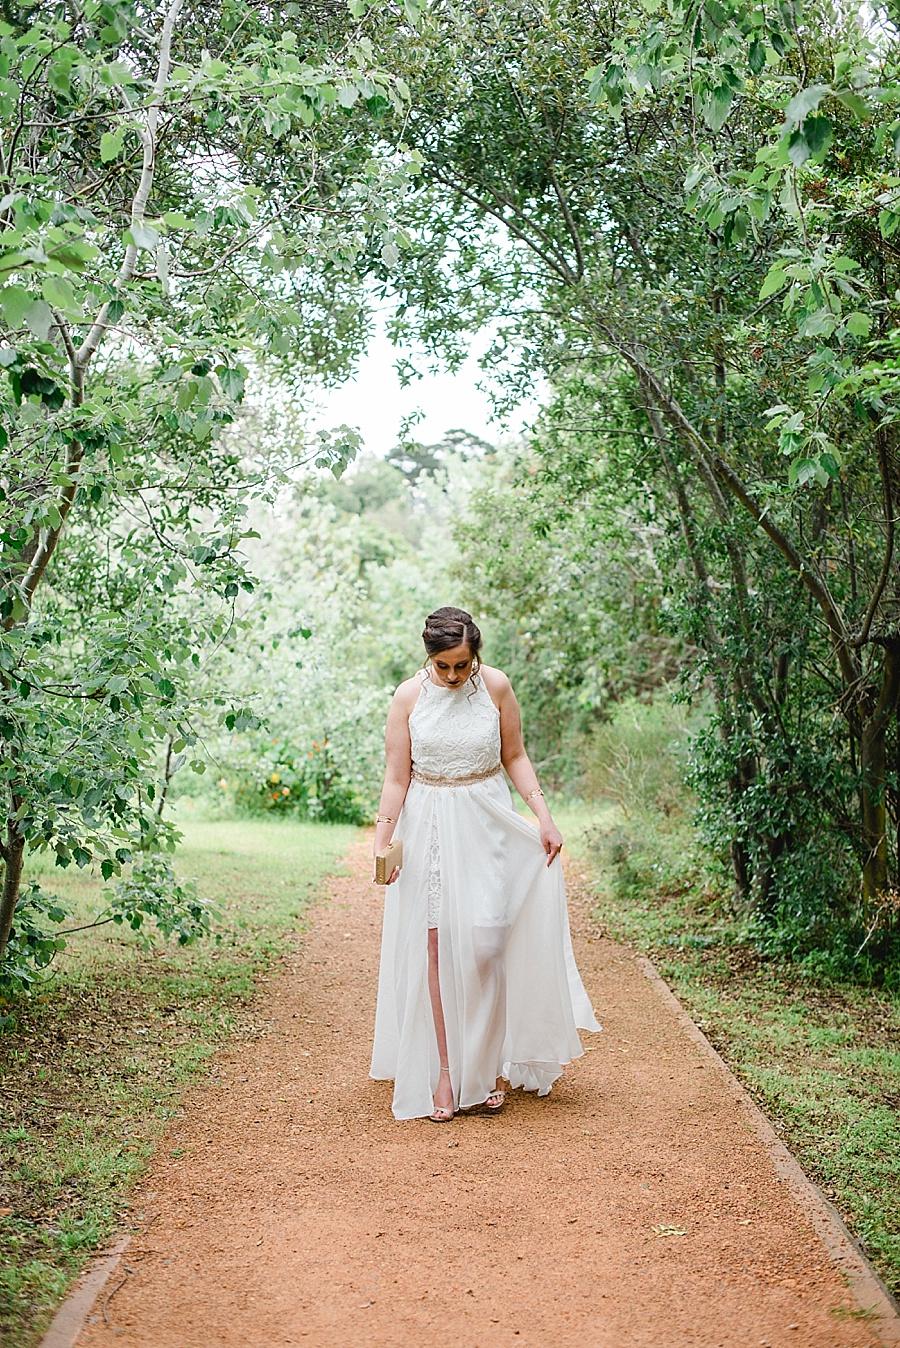 Darren Bester - Cape Town Photographer - Wedding - Portrait - Matric Dance_0001.jpg